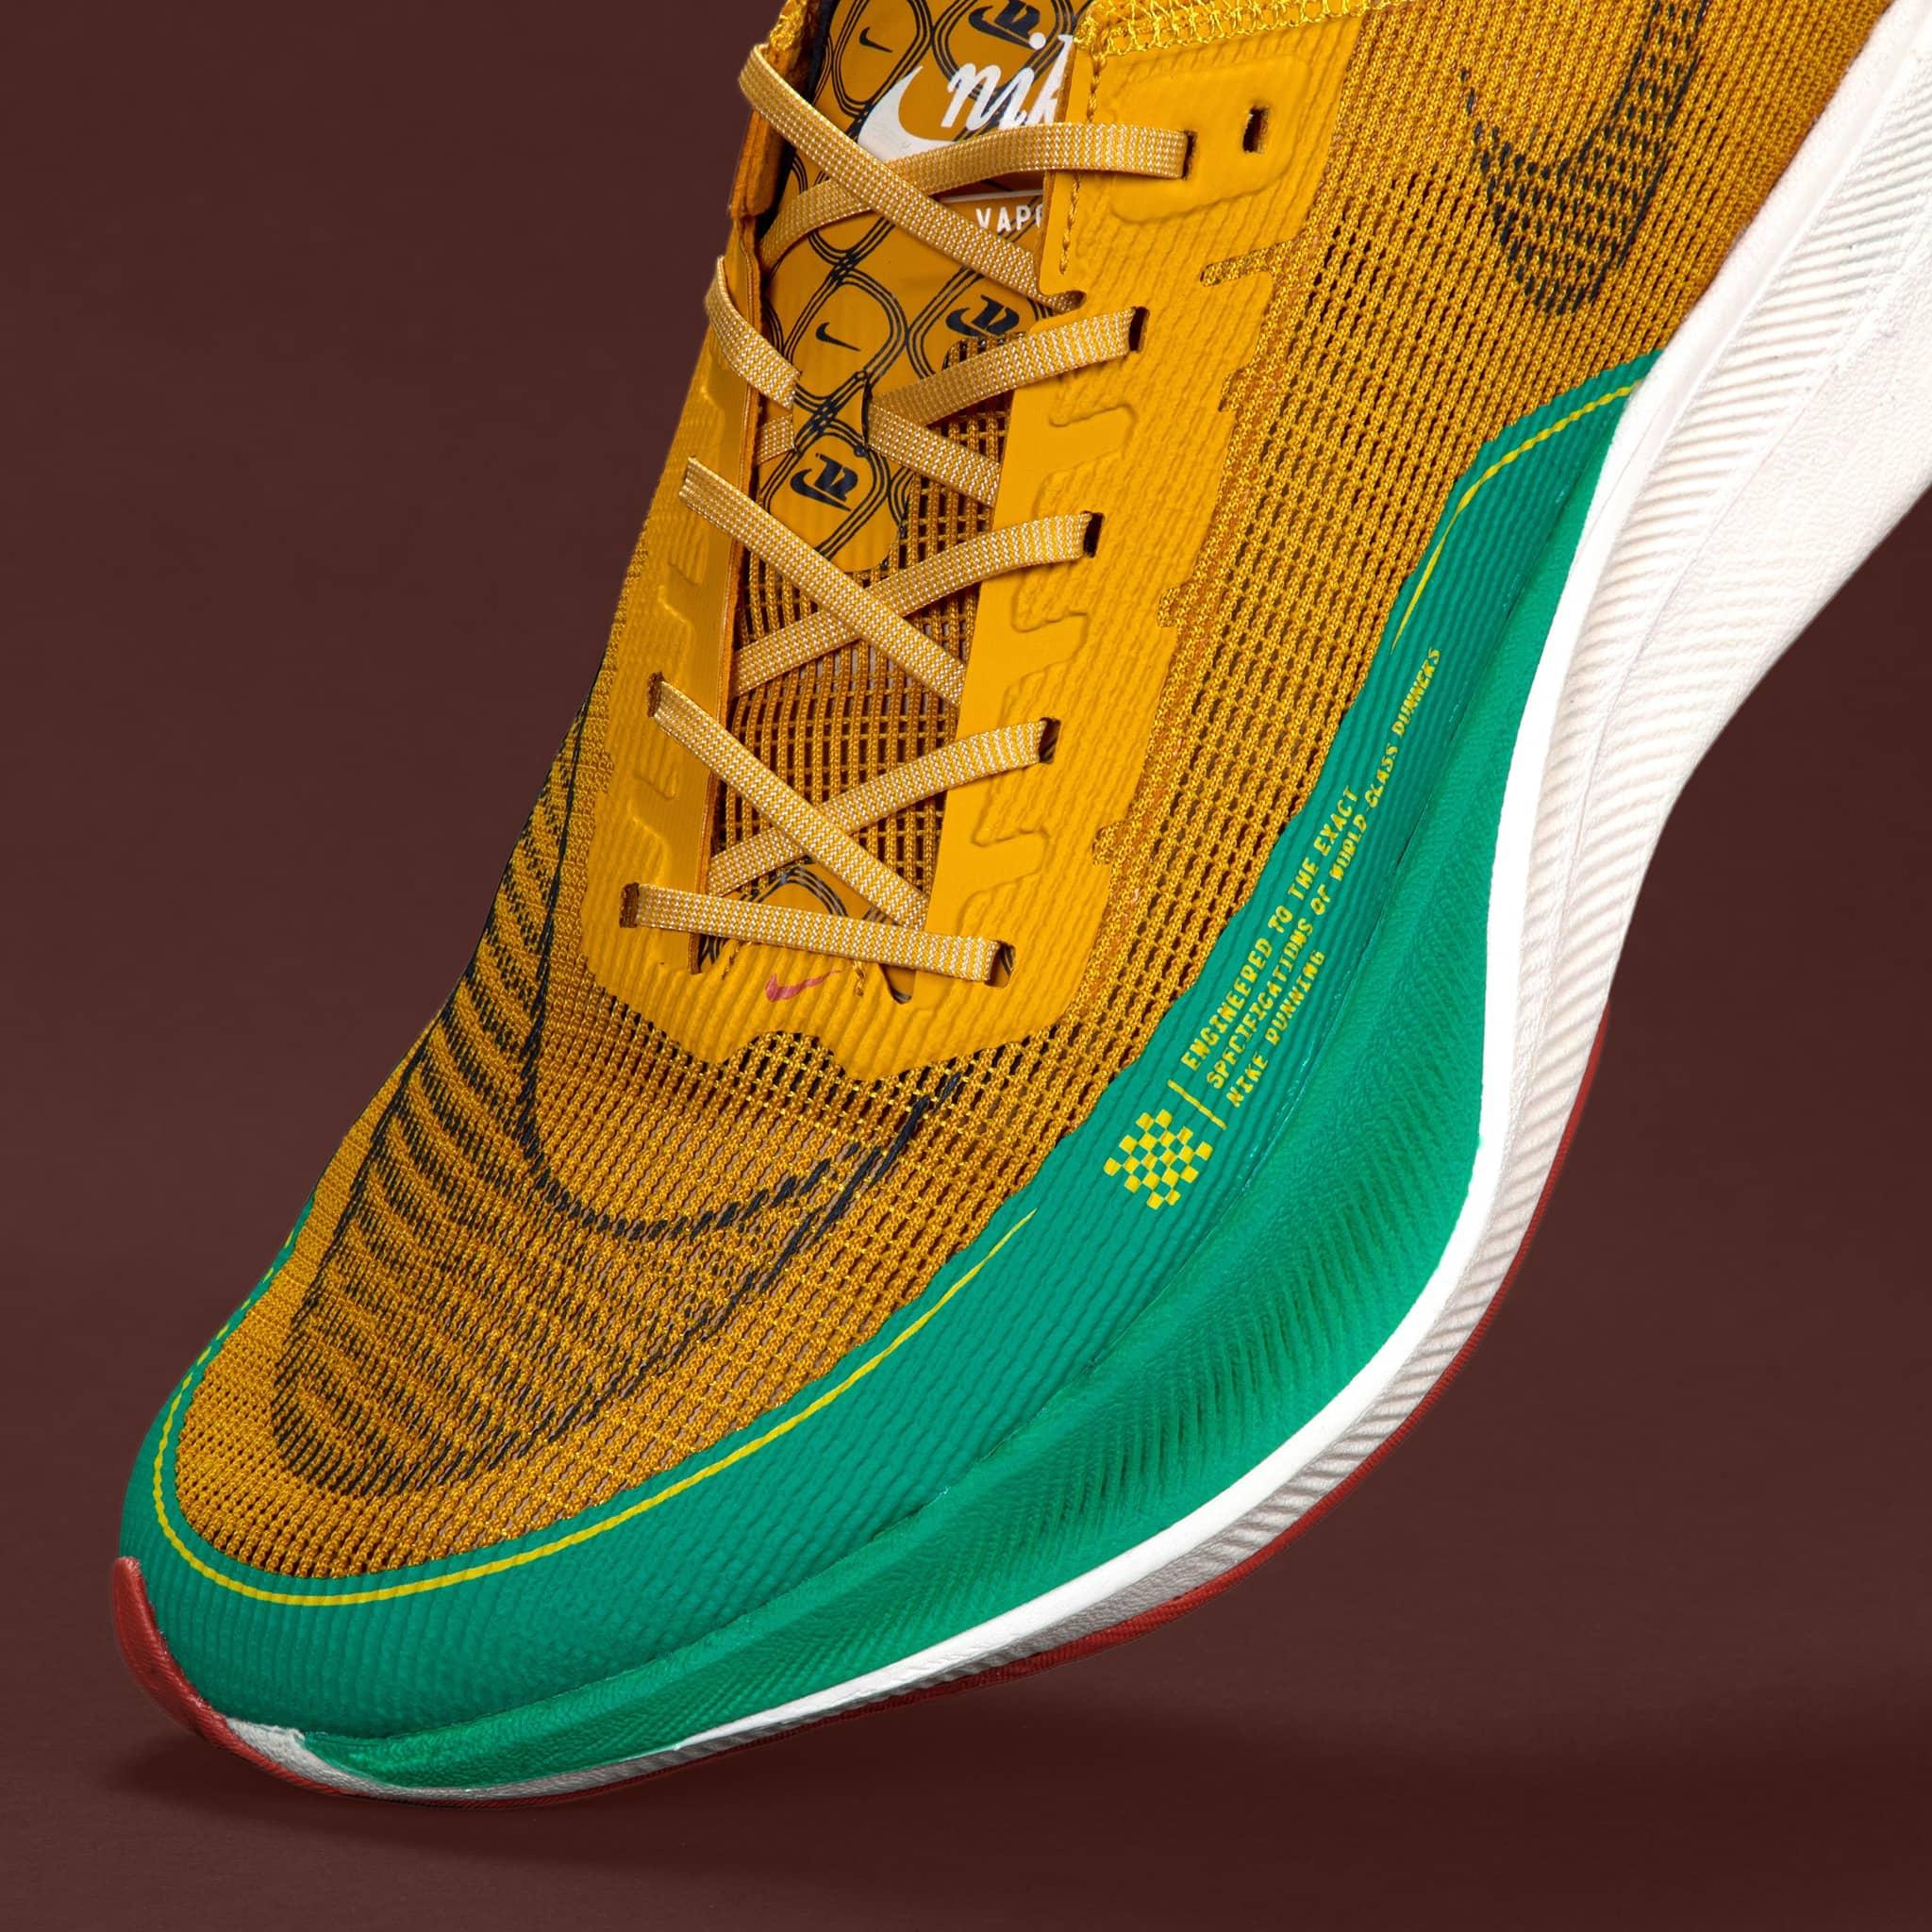 Nike ZoomX Vaporfly Next% 2 edición Hayward Field